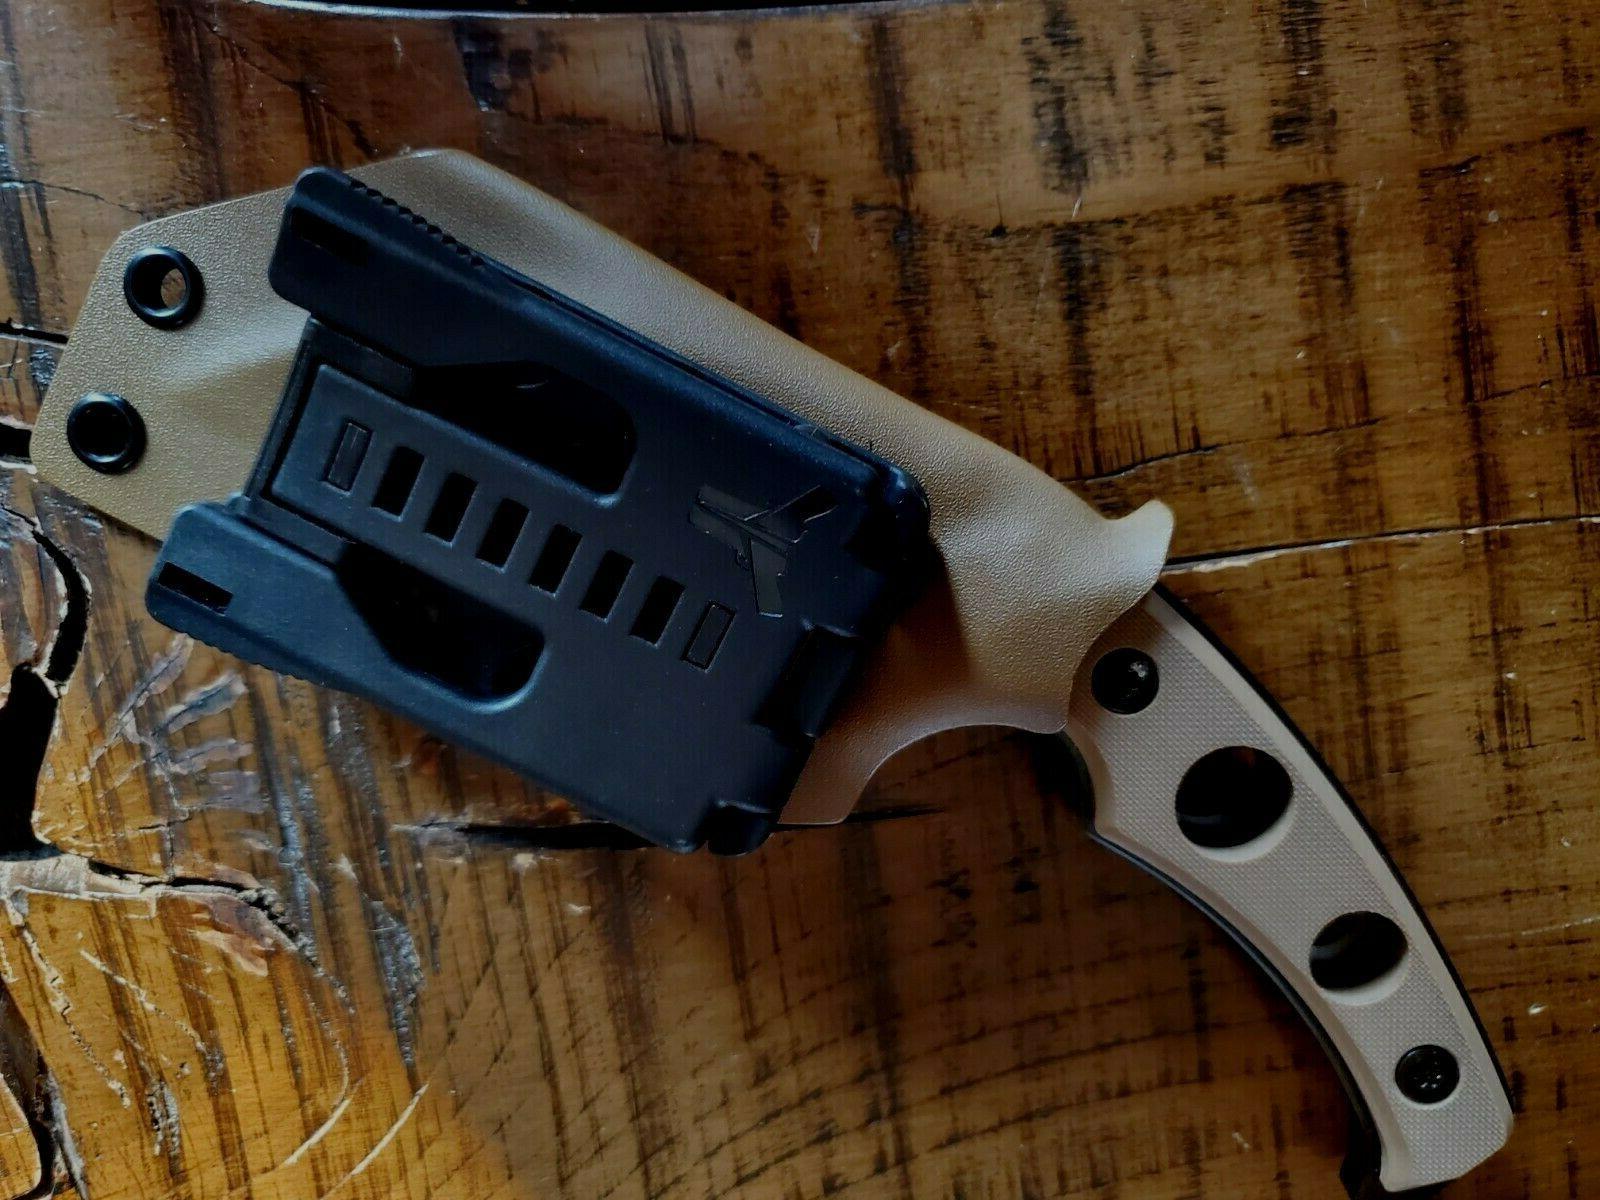 Medford Knife - Utility - PVD S35VN tan